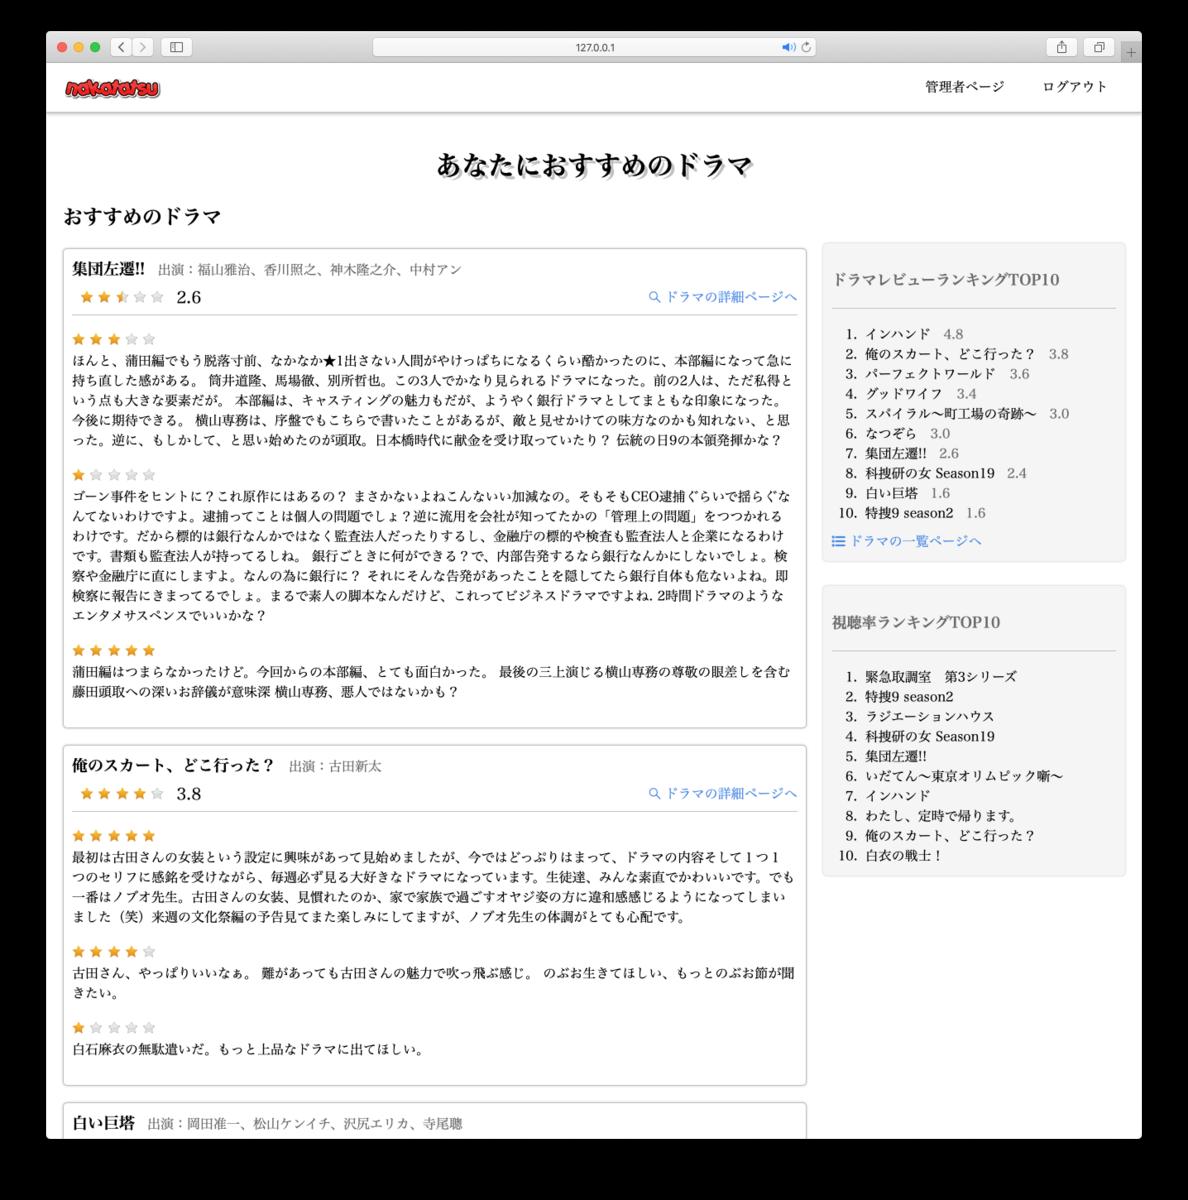 f:id:nakatatsu_com:20190614020755p:plain